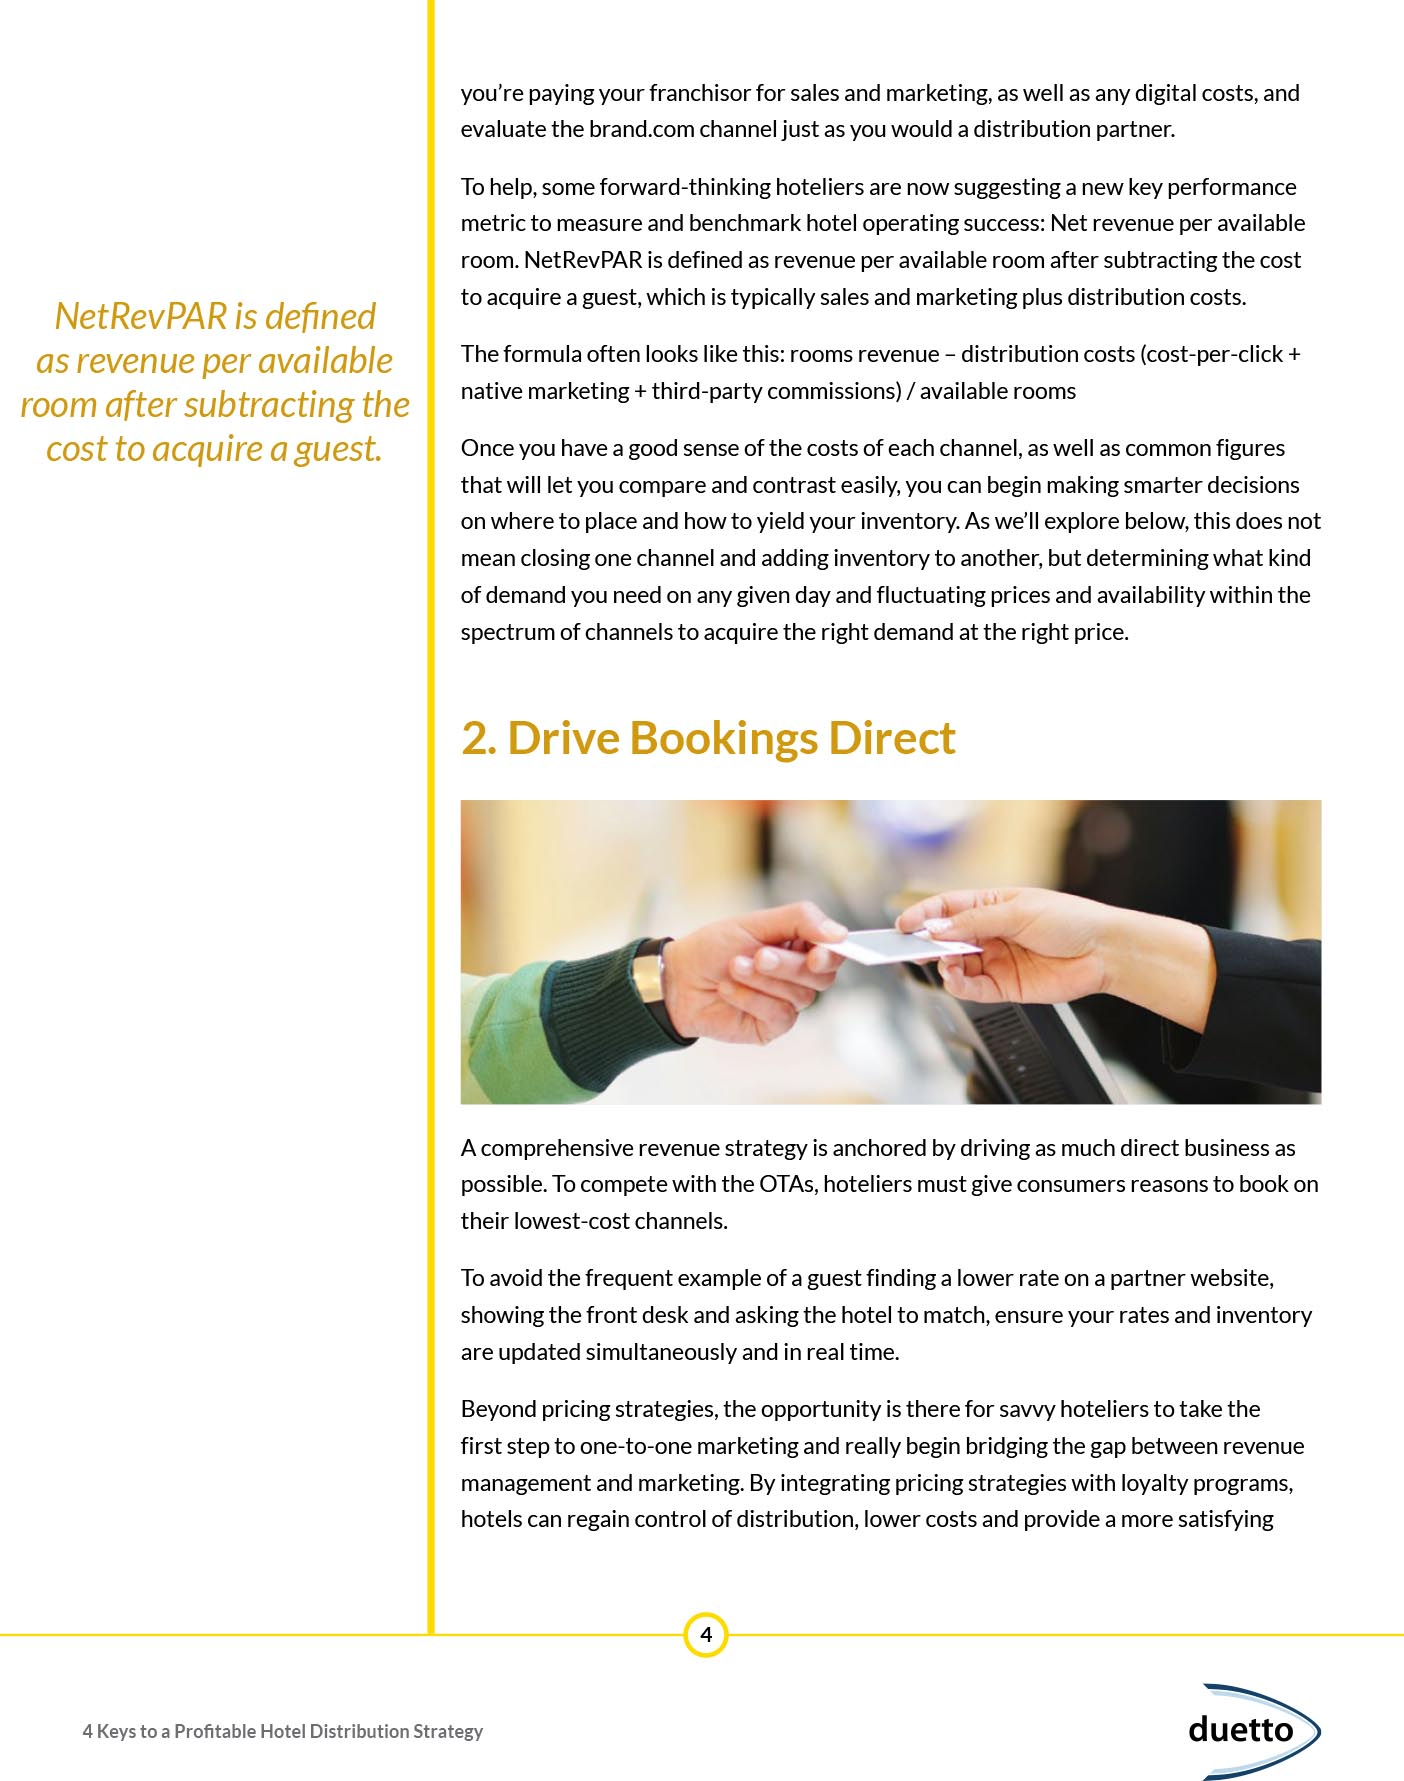 4 4-keys-to-a-profitable-hotel-distribution-strategy-4.jpg